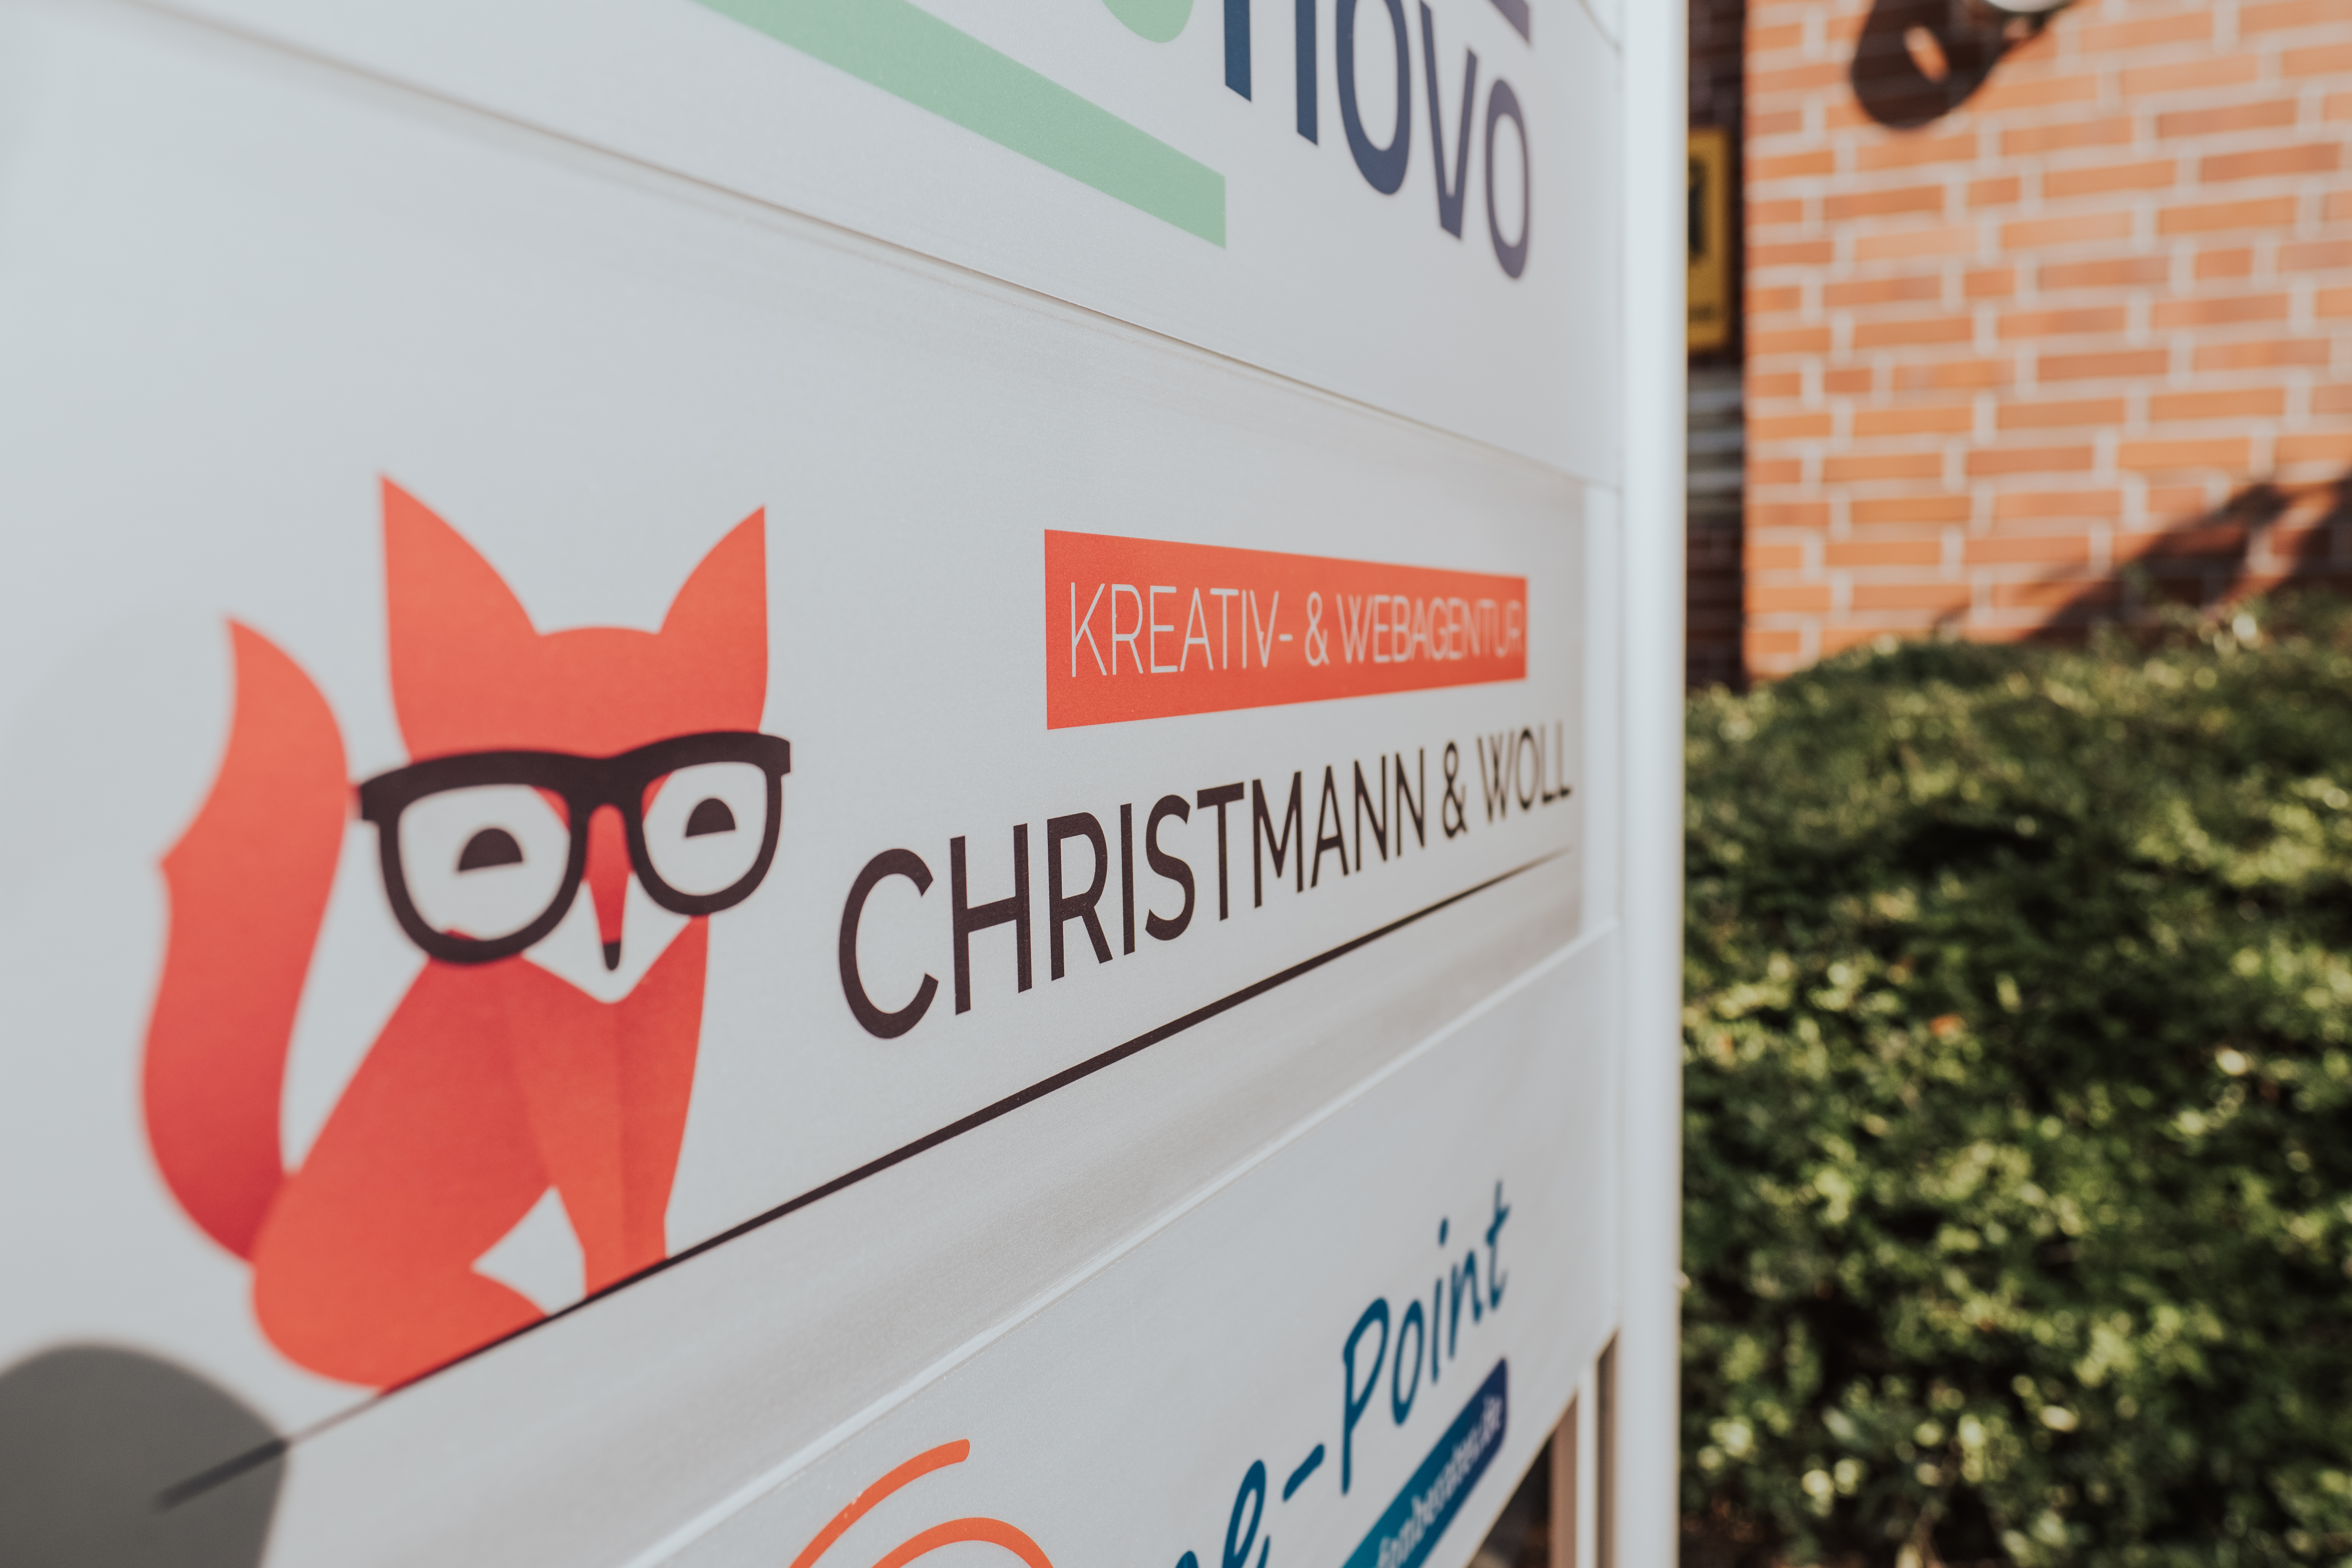 Logo.jpg – Christmann & Woll GmbH